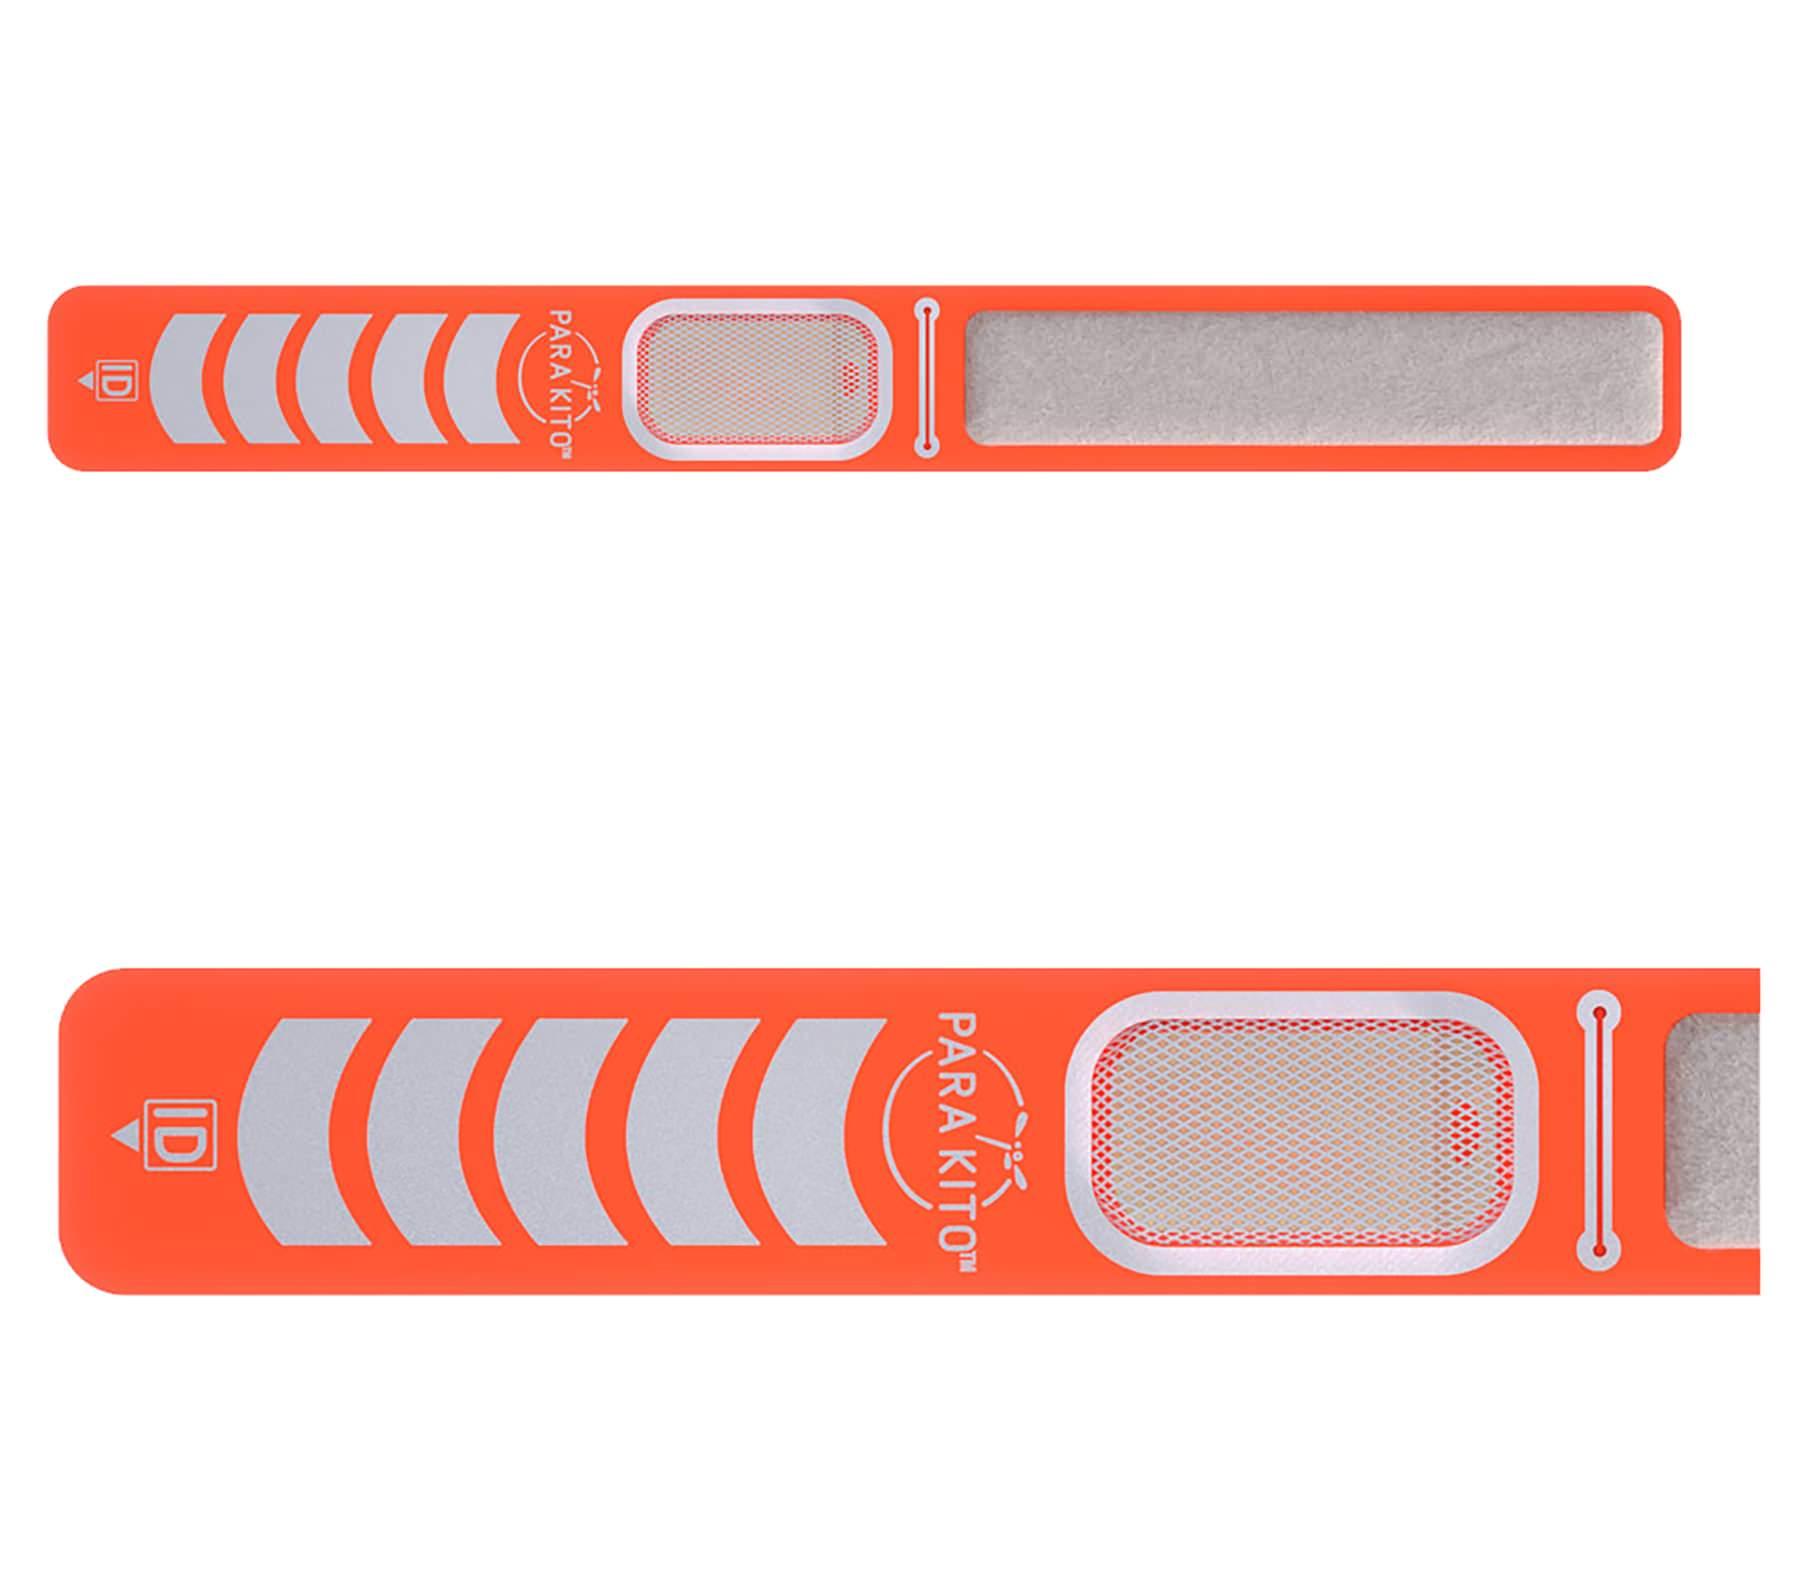 vong-tay-chong-muoi-the-thao-Parakito-Orange-Sport-Band-8026-Cam-2.jpg